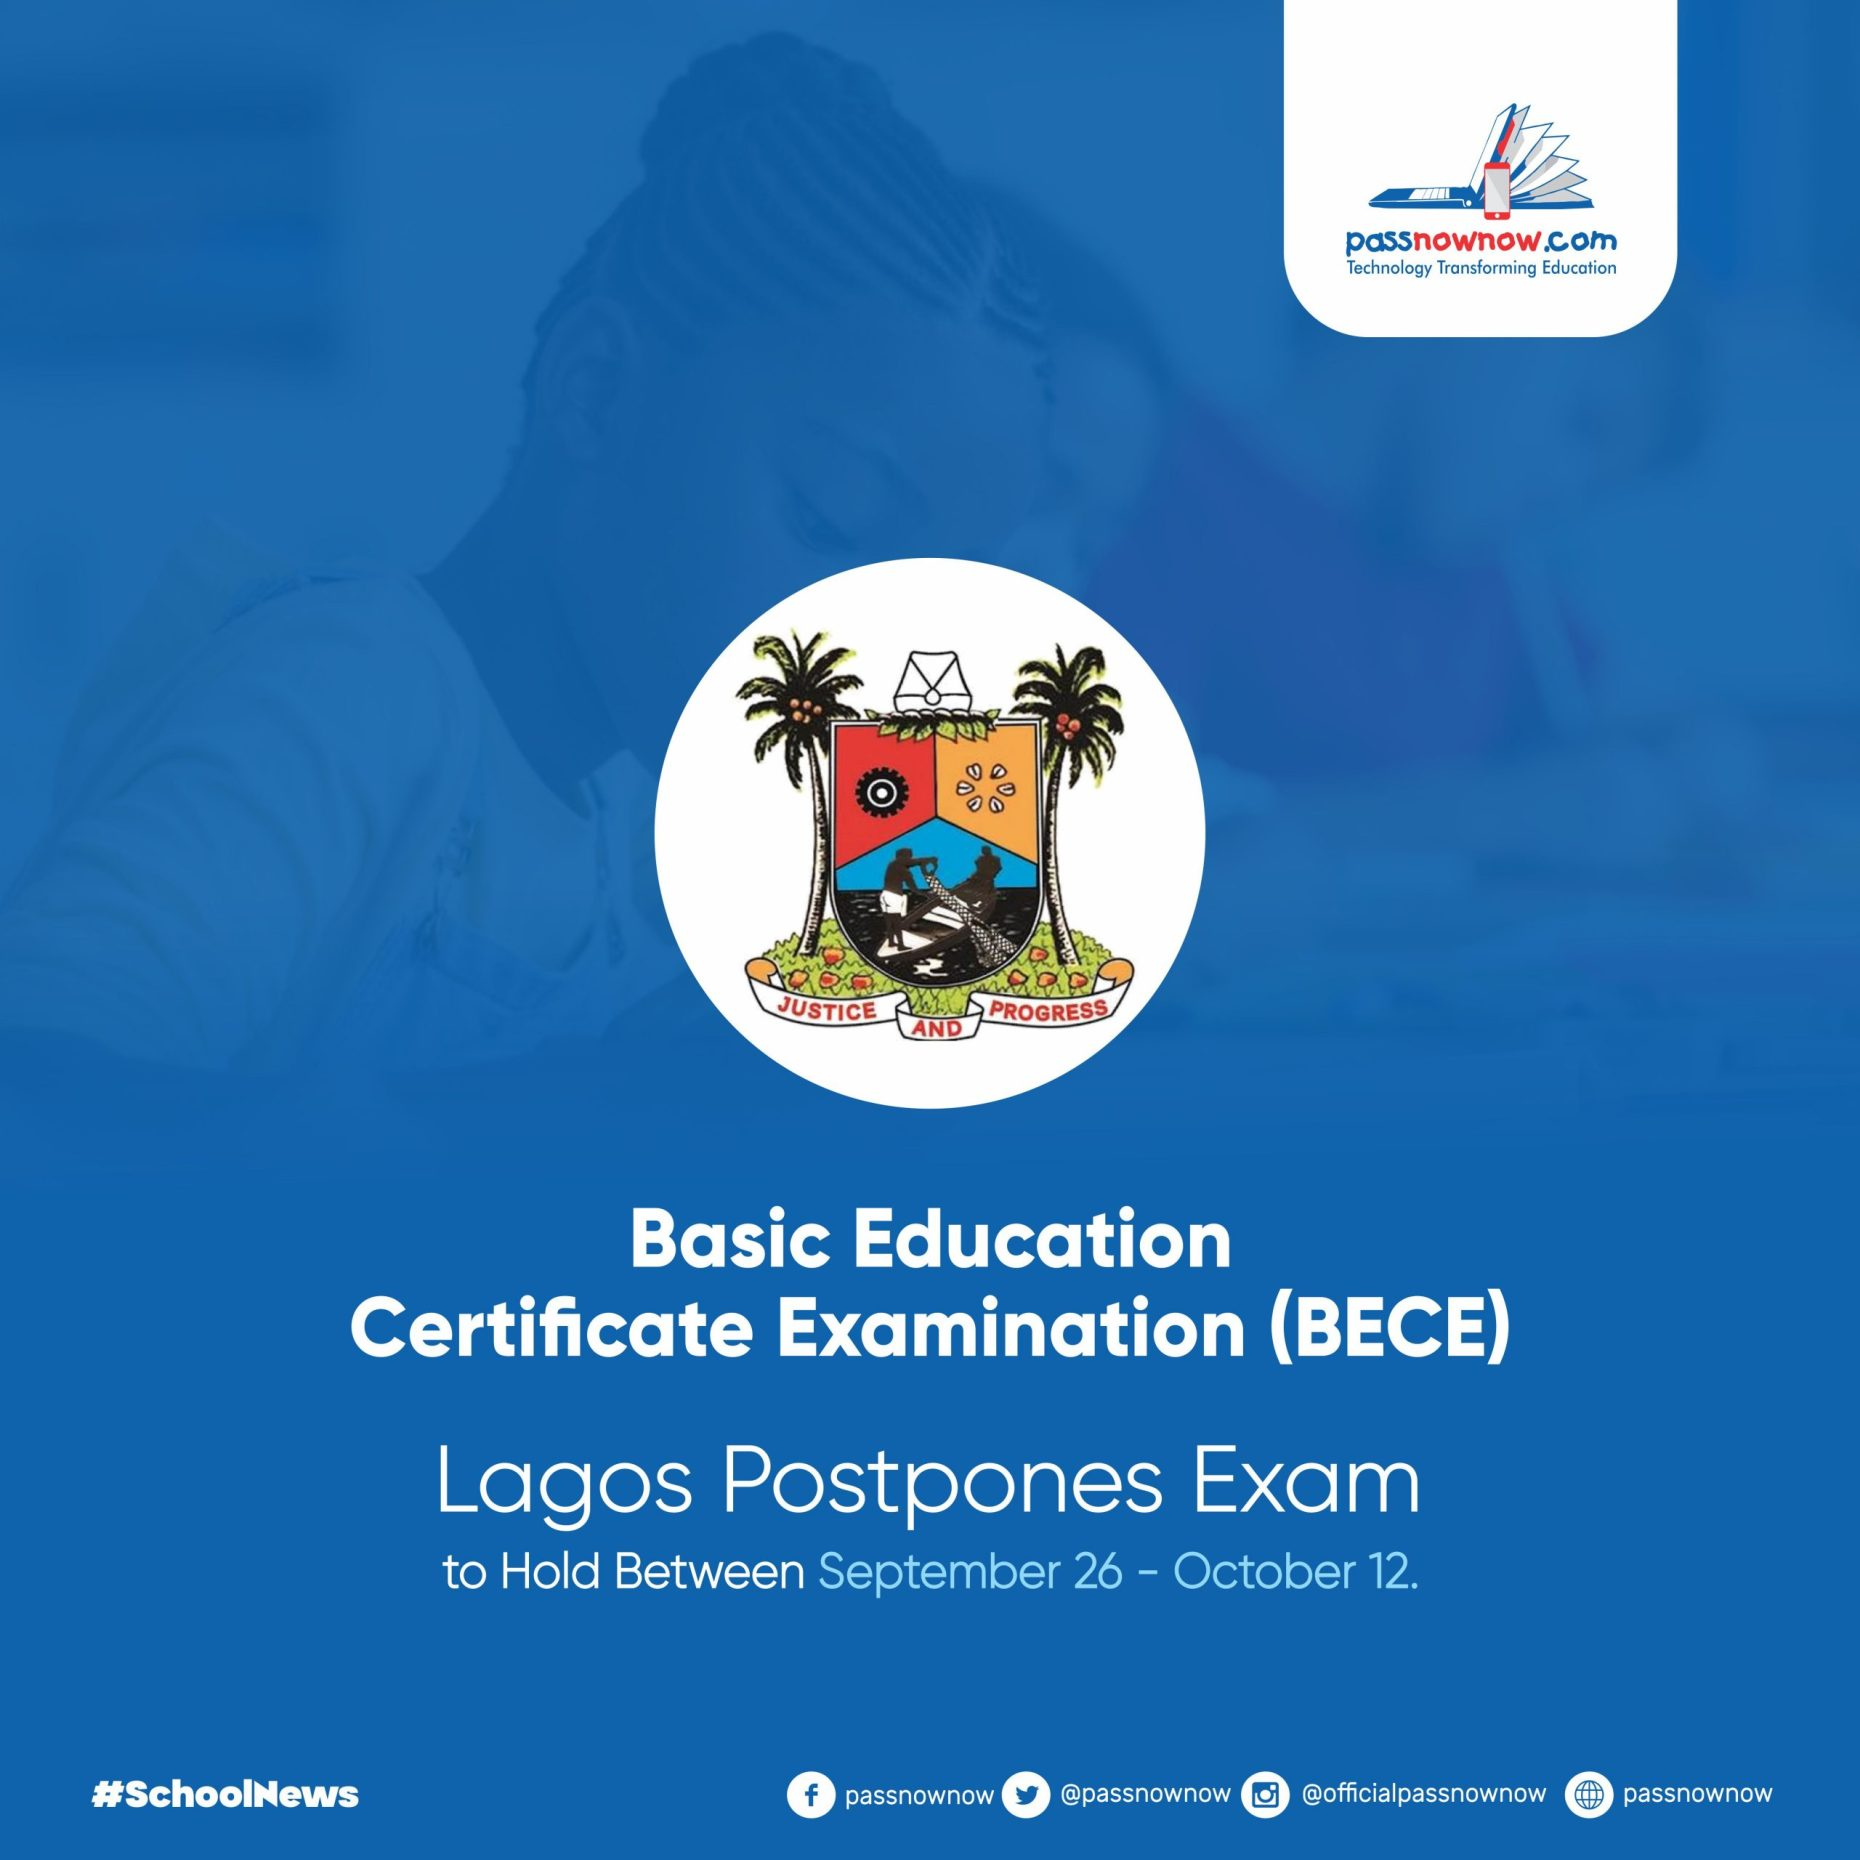 Basic Education Certificate Examination Lagos Postpones Exams